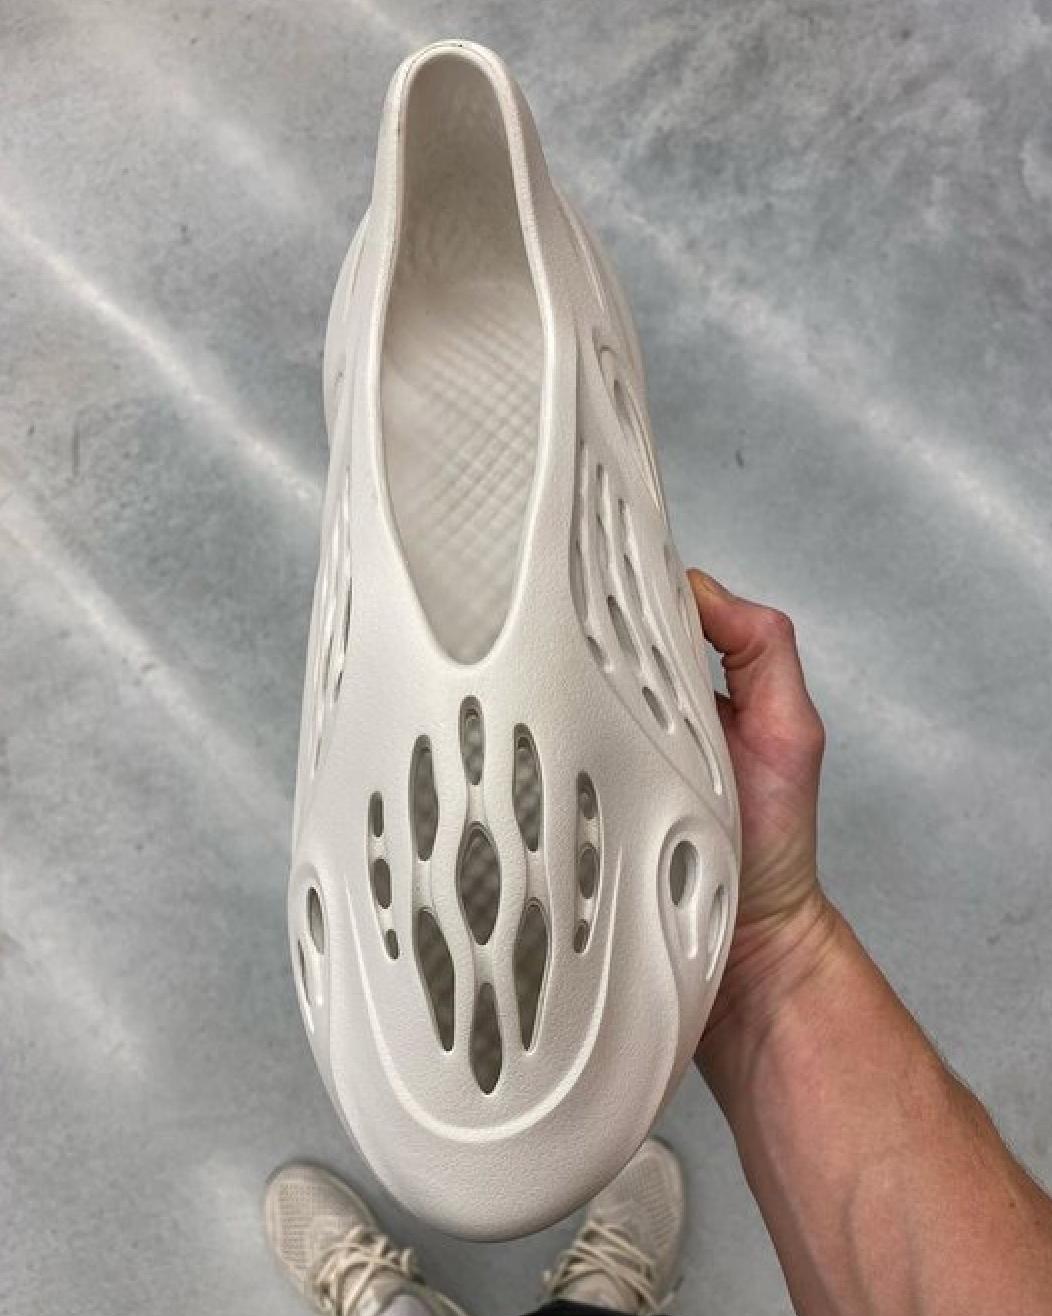 adidas Yeezy Foam Runner Croc